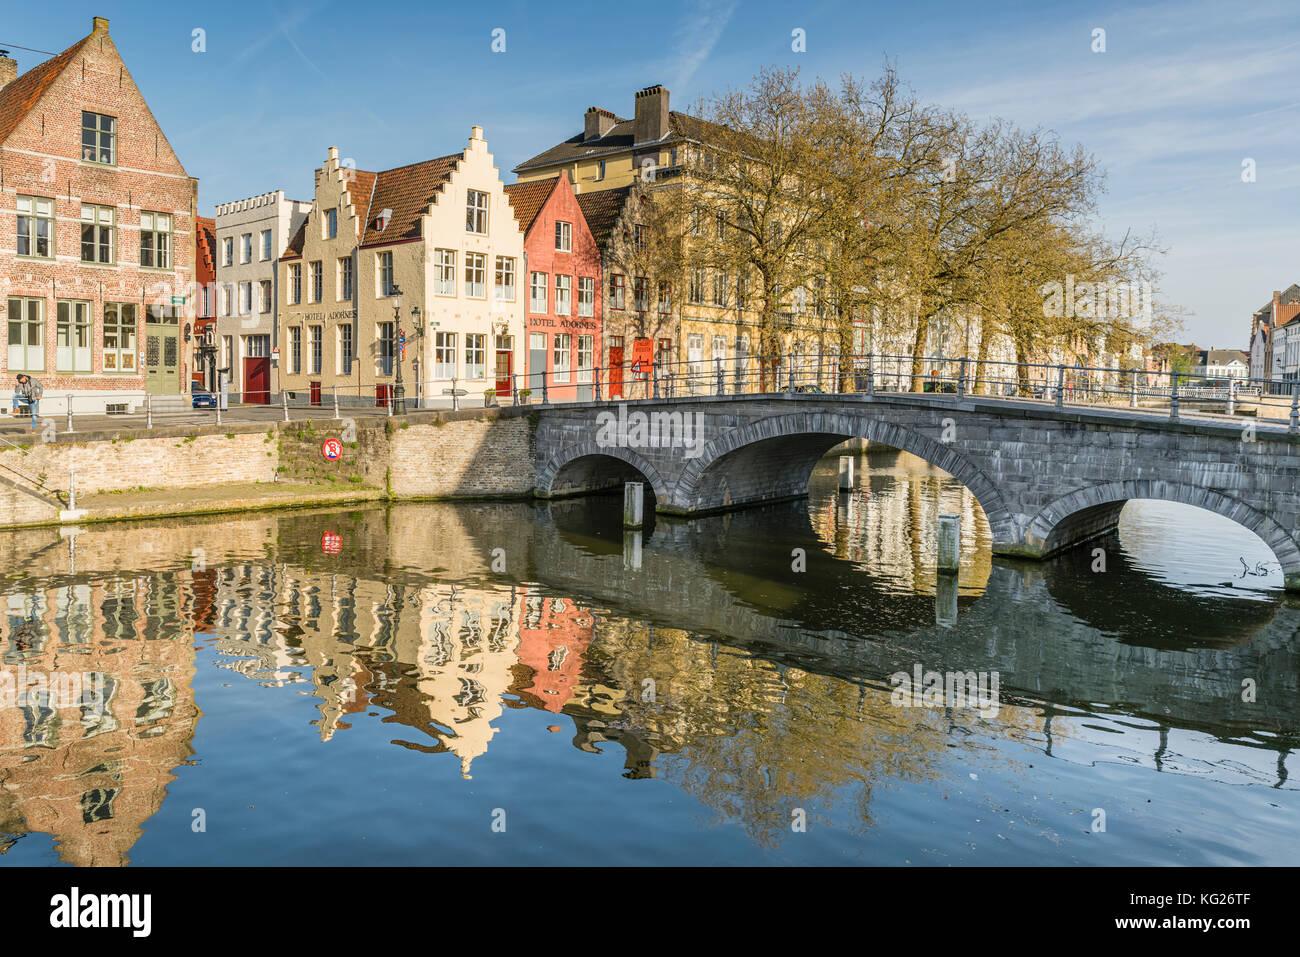 Bridge and houses on the Langerei canal, Bruges, West Flanders province, Flemish region, Belgium, Europe Stock Photo